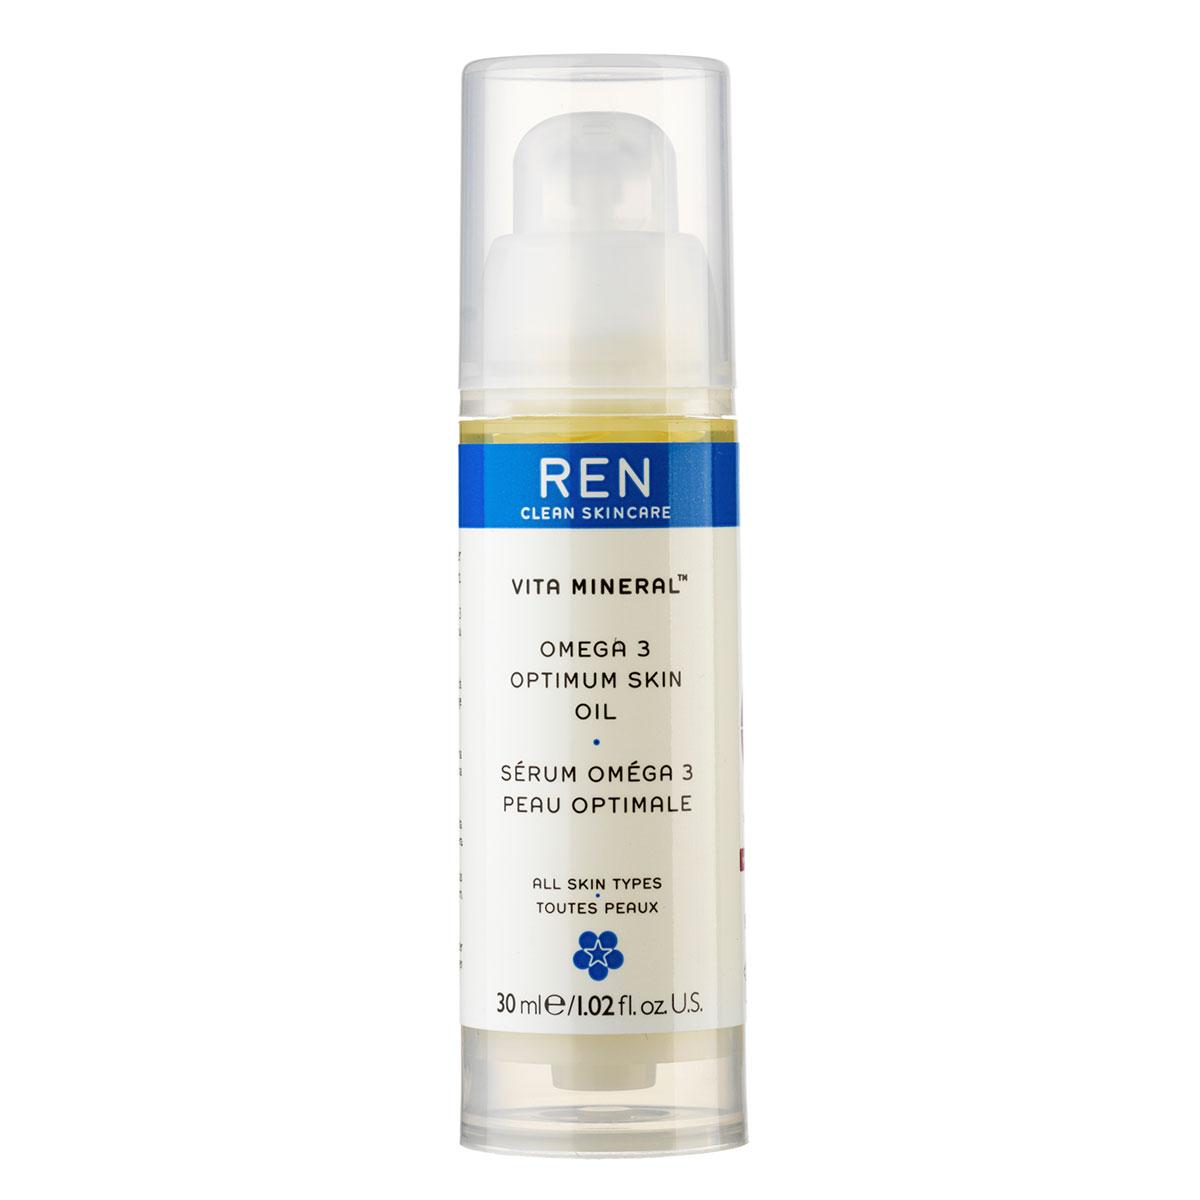 Billede af REN Vita Mineral Omega 3 Optimum Skin Oil - 30 ml